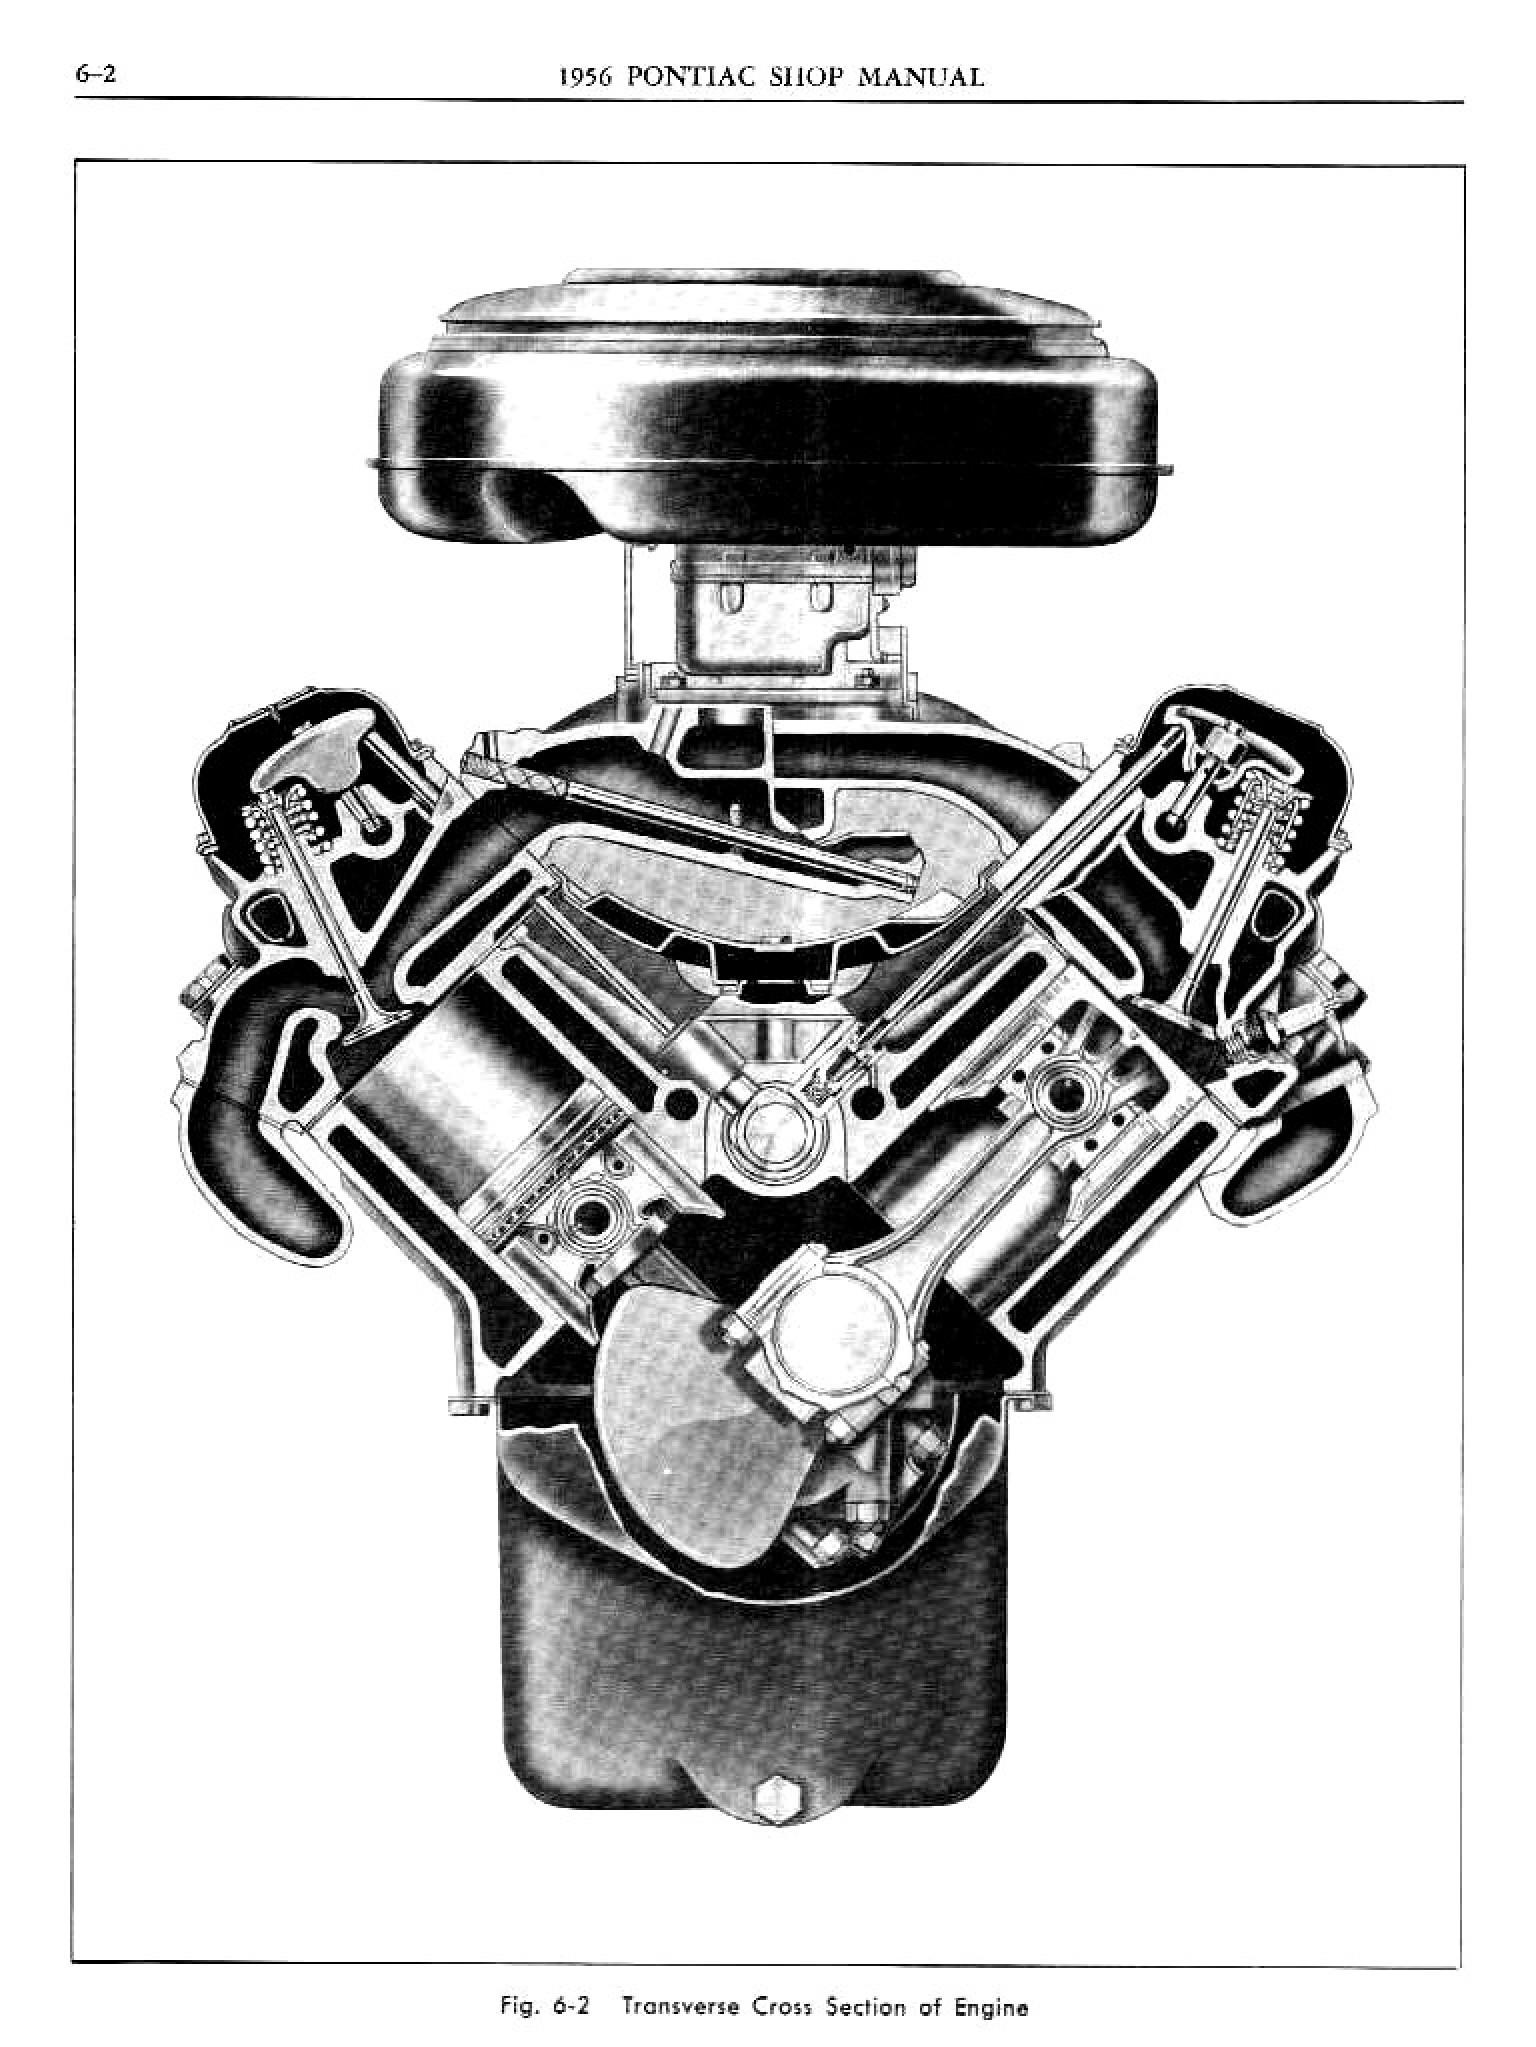 1956 Pontiac Shop Manual- Engine Page 3 of 56